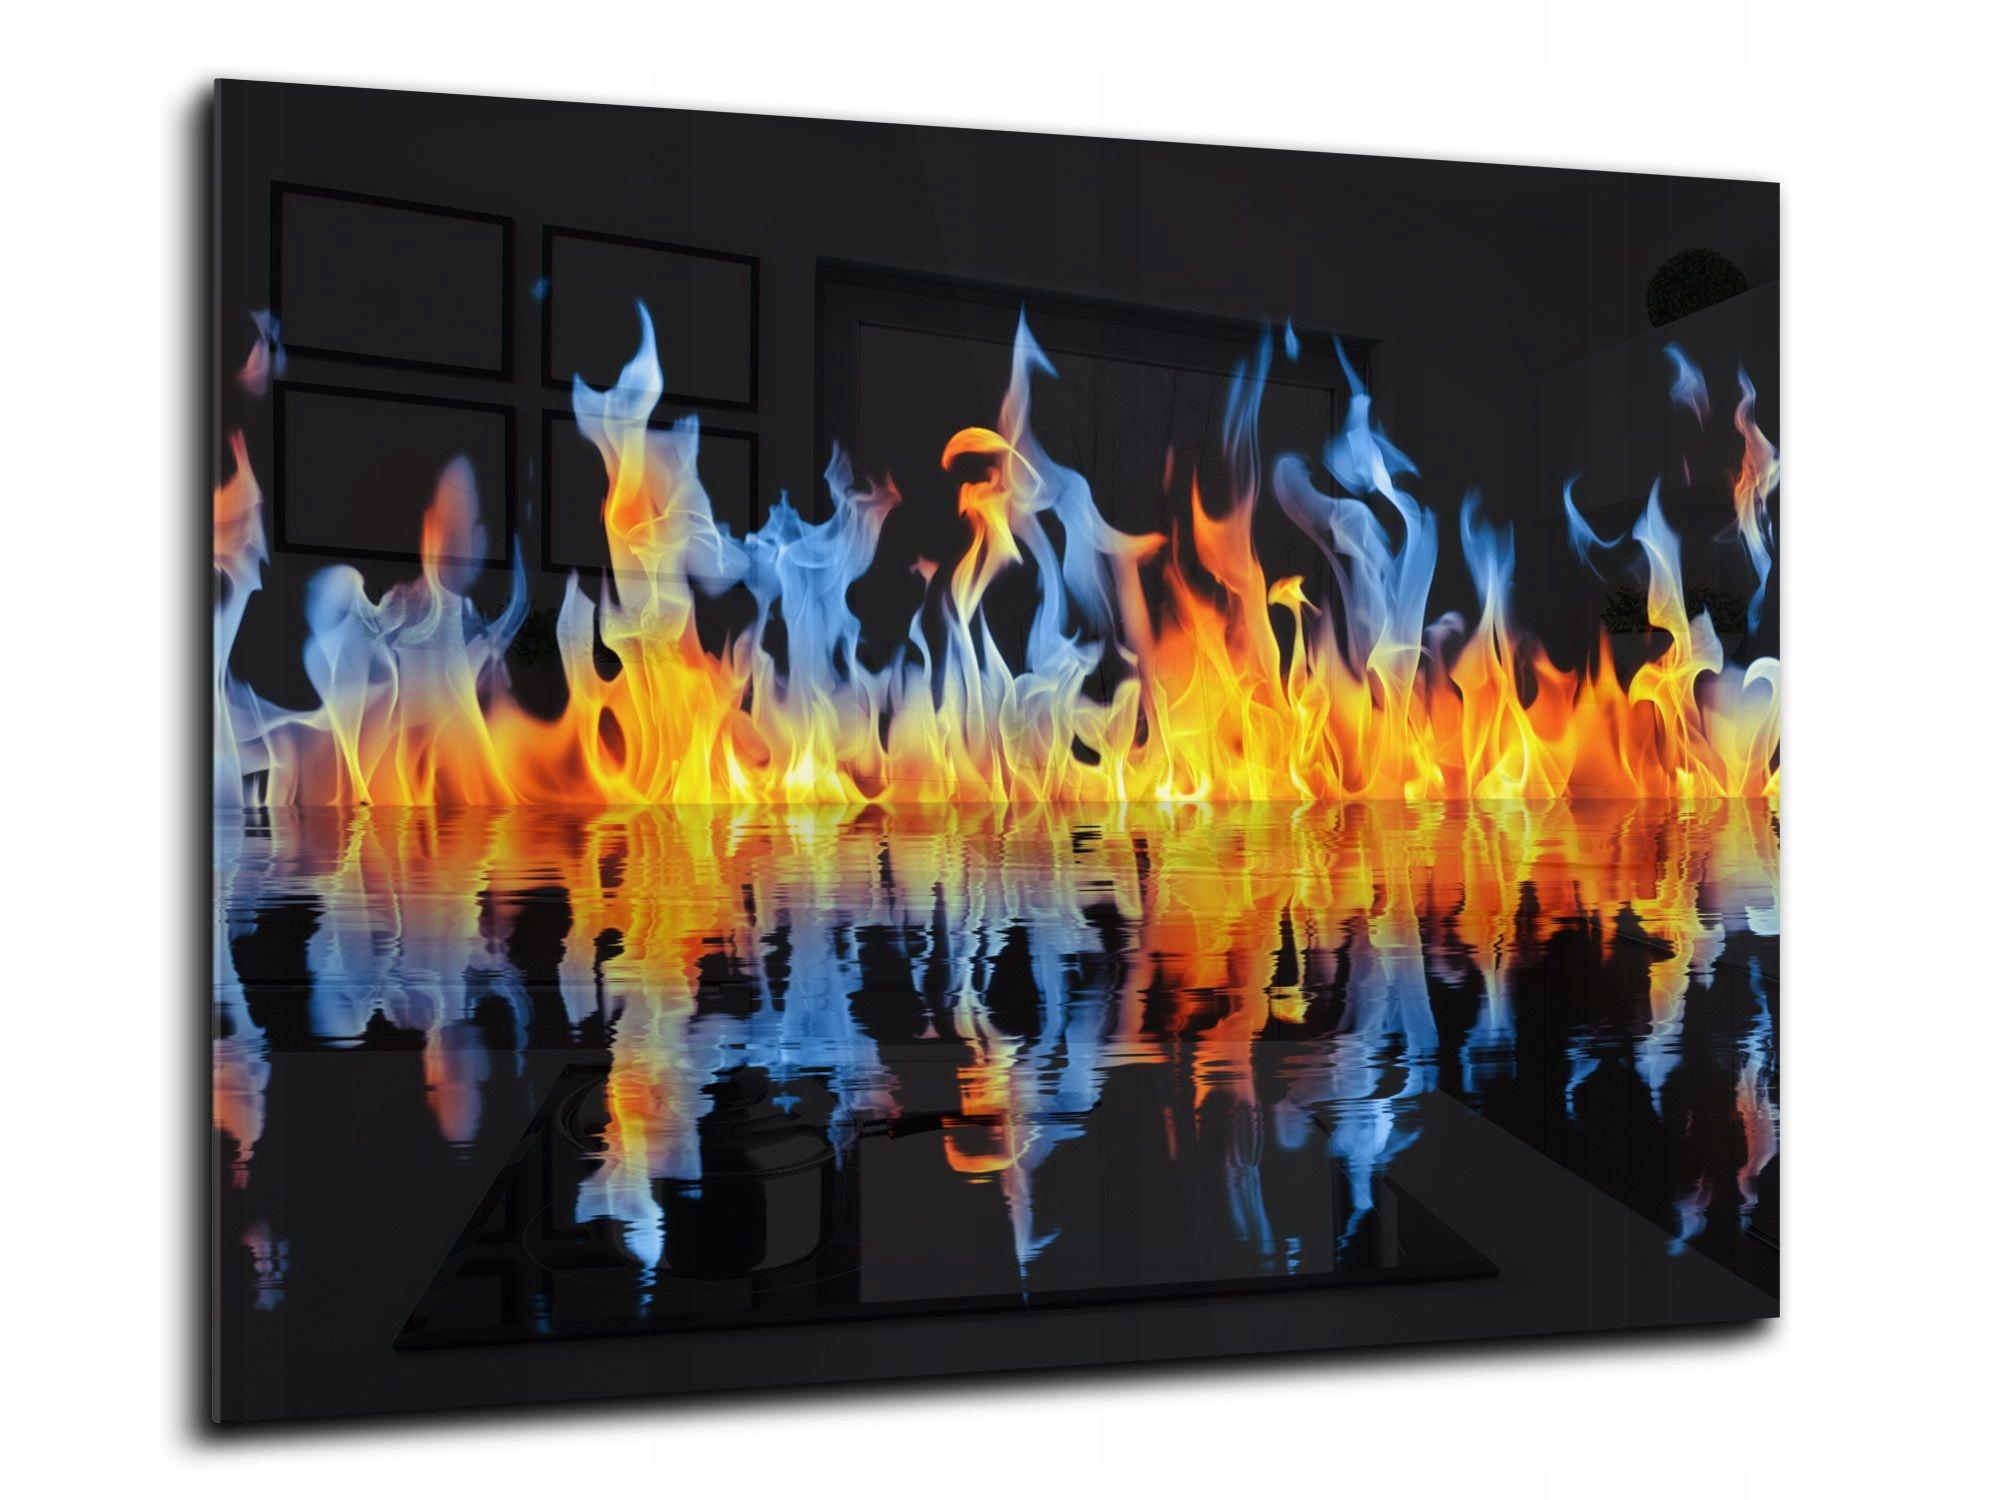 steny dlaždice, sklo, kuchynské 90x65 požiaru